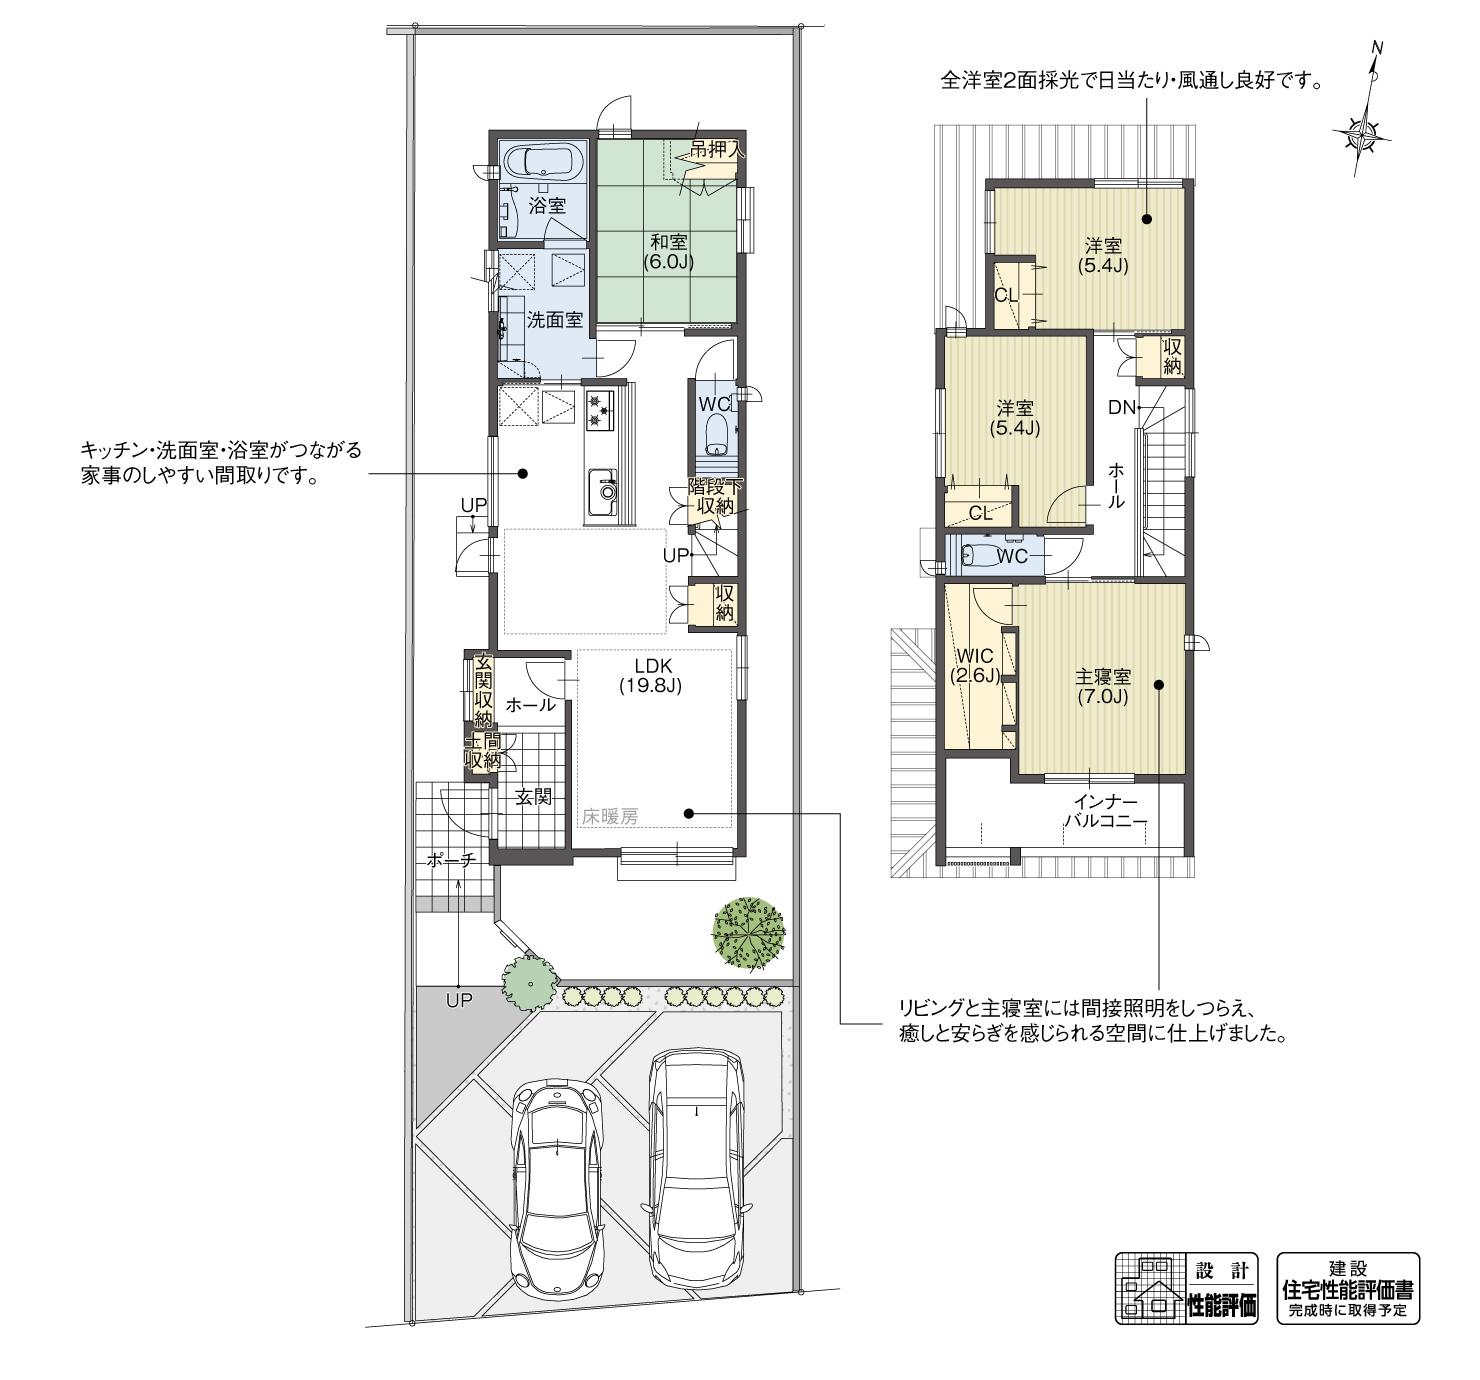 5_間取図_plan2_名東区高針台2